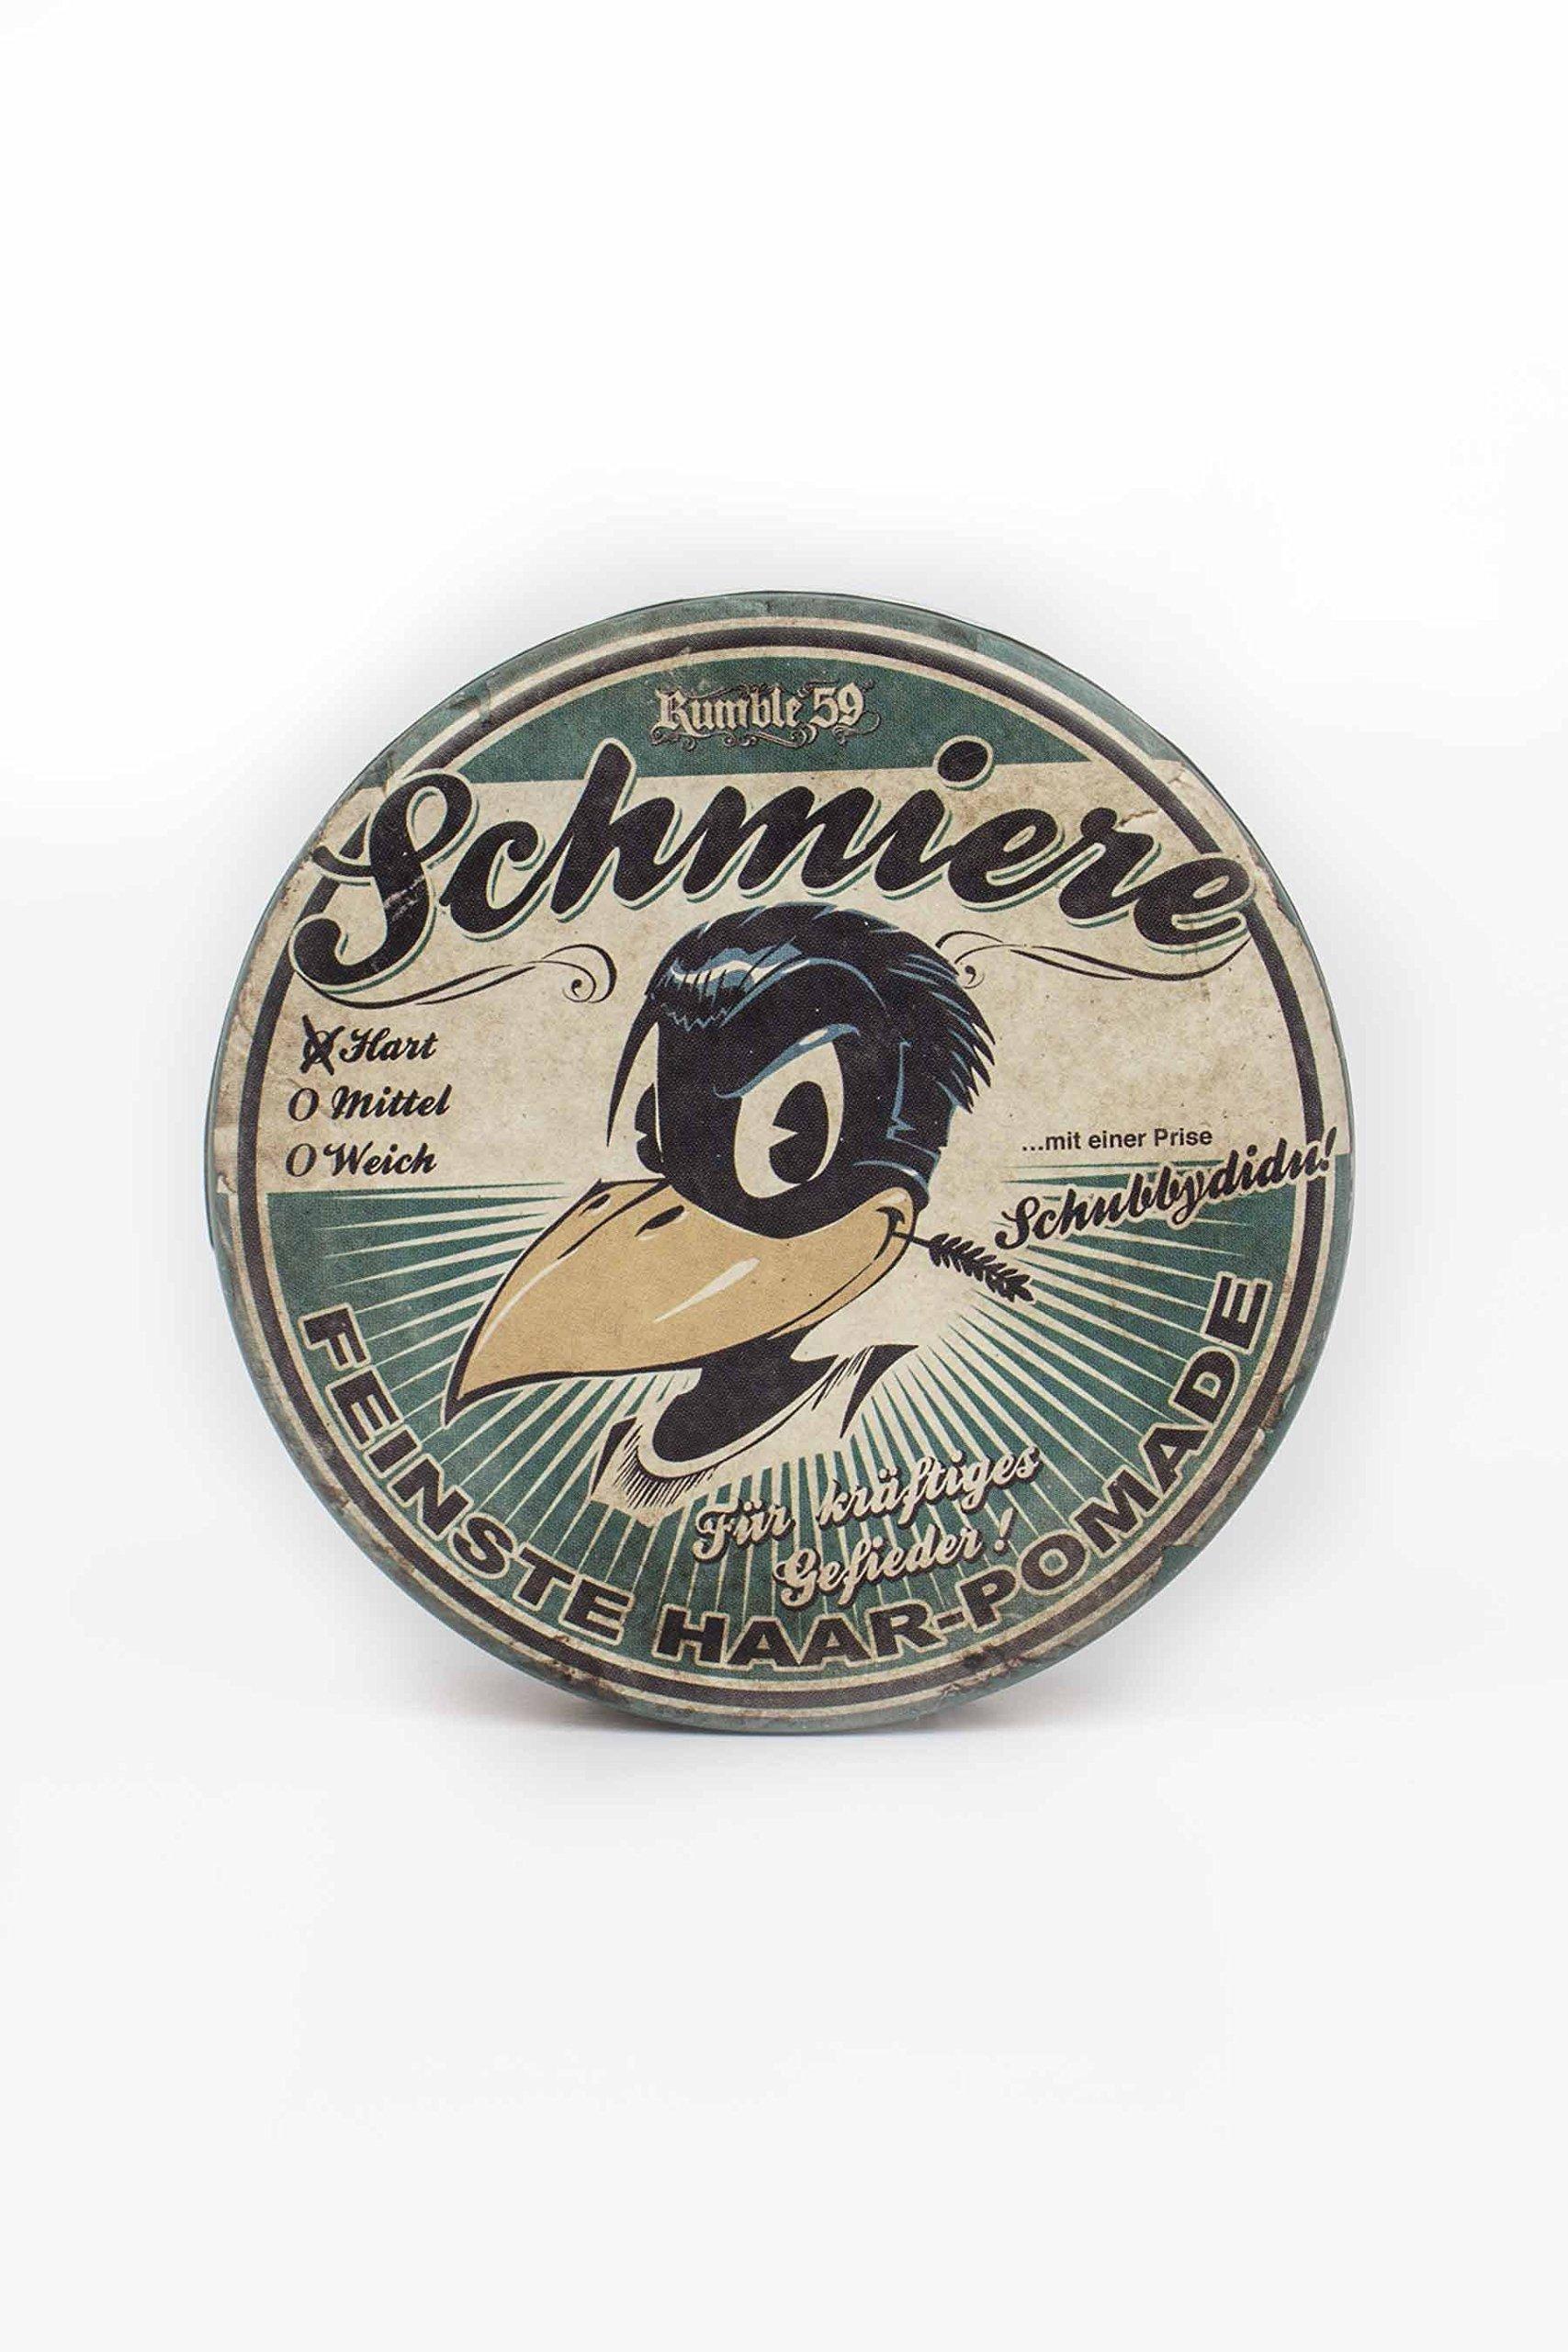 Rumble 59 Schmiere Hart (Hard) Hair Grease Pomade by Rumble59 Schmiere